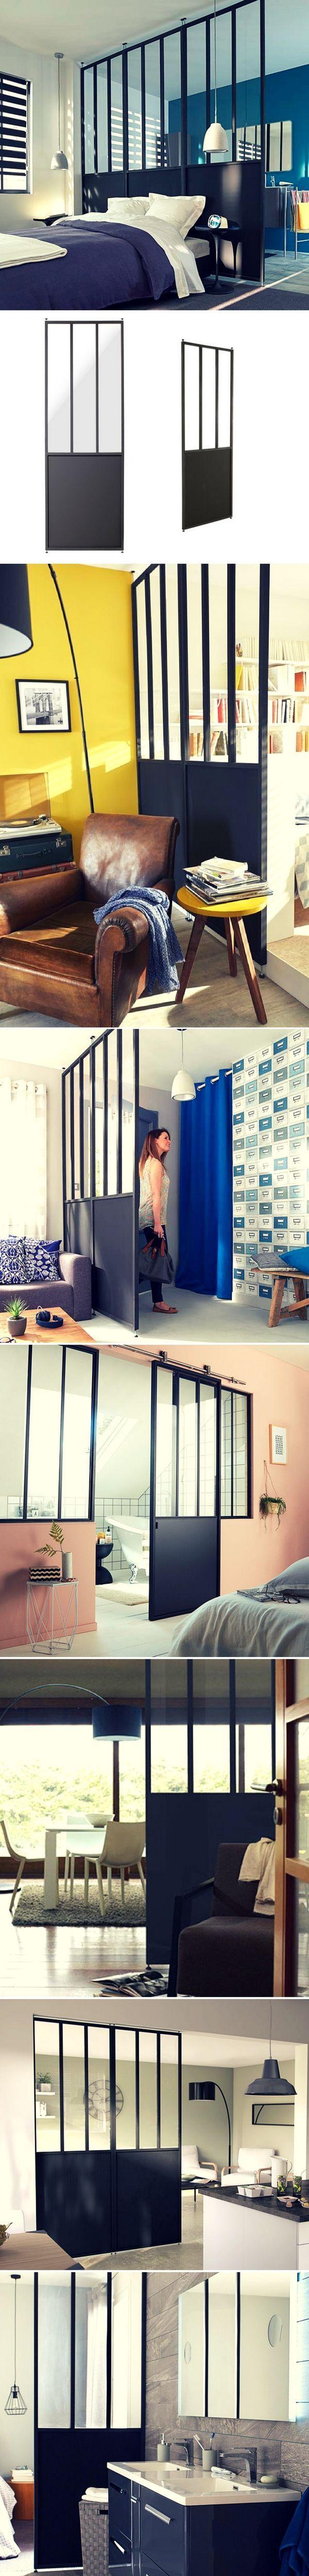 id e relooking cuisine verri re castorama les. Black Bedroom Furniture Sets. Home Design Ideas